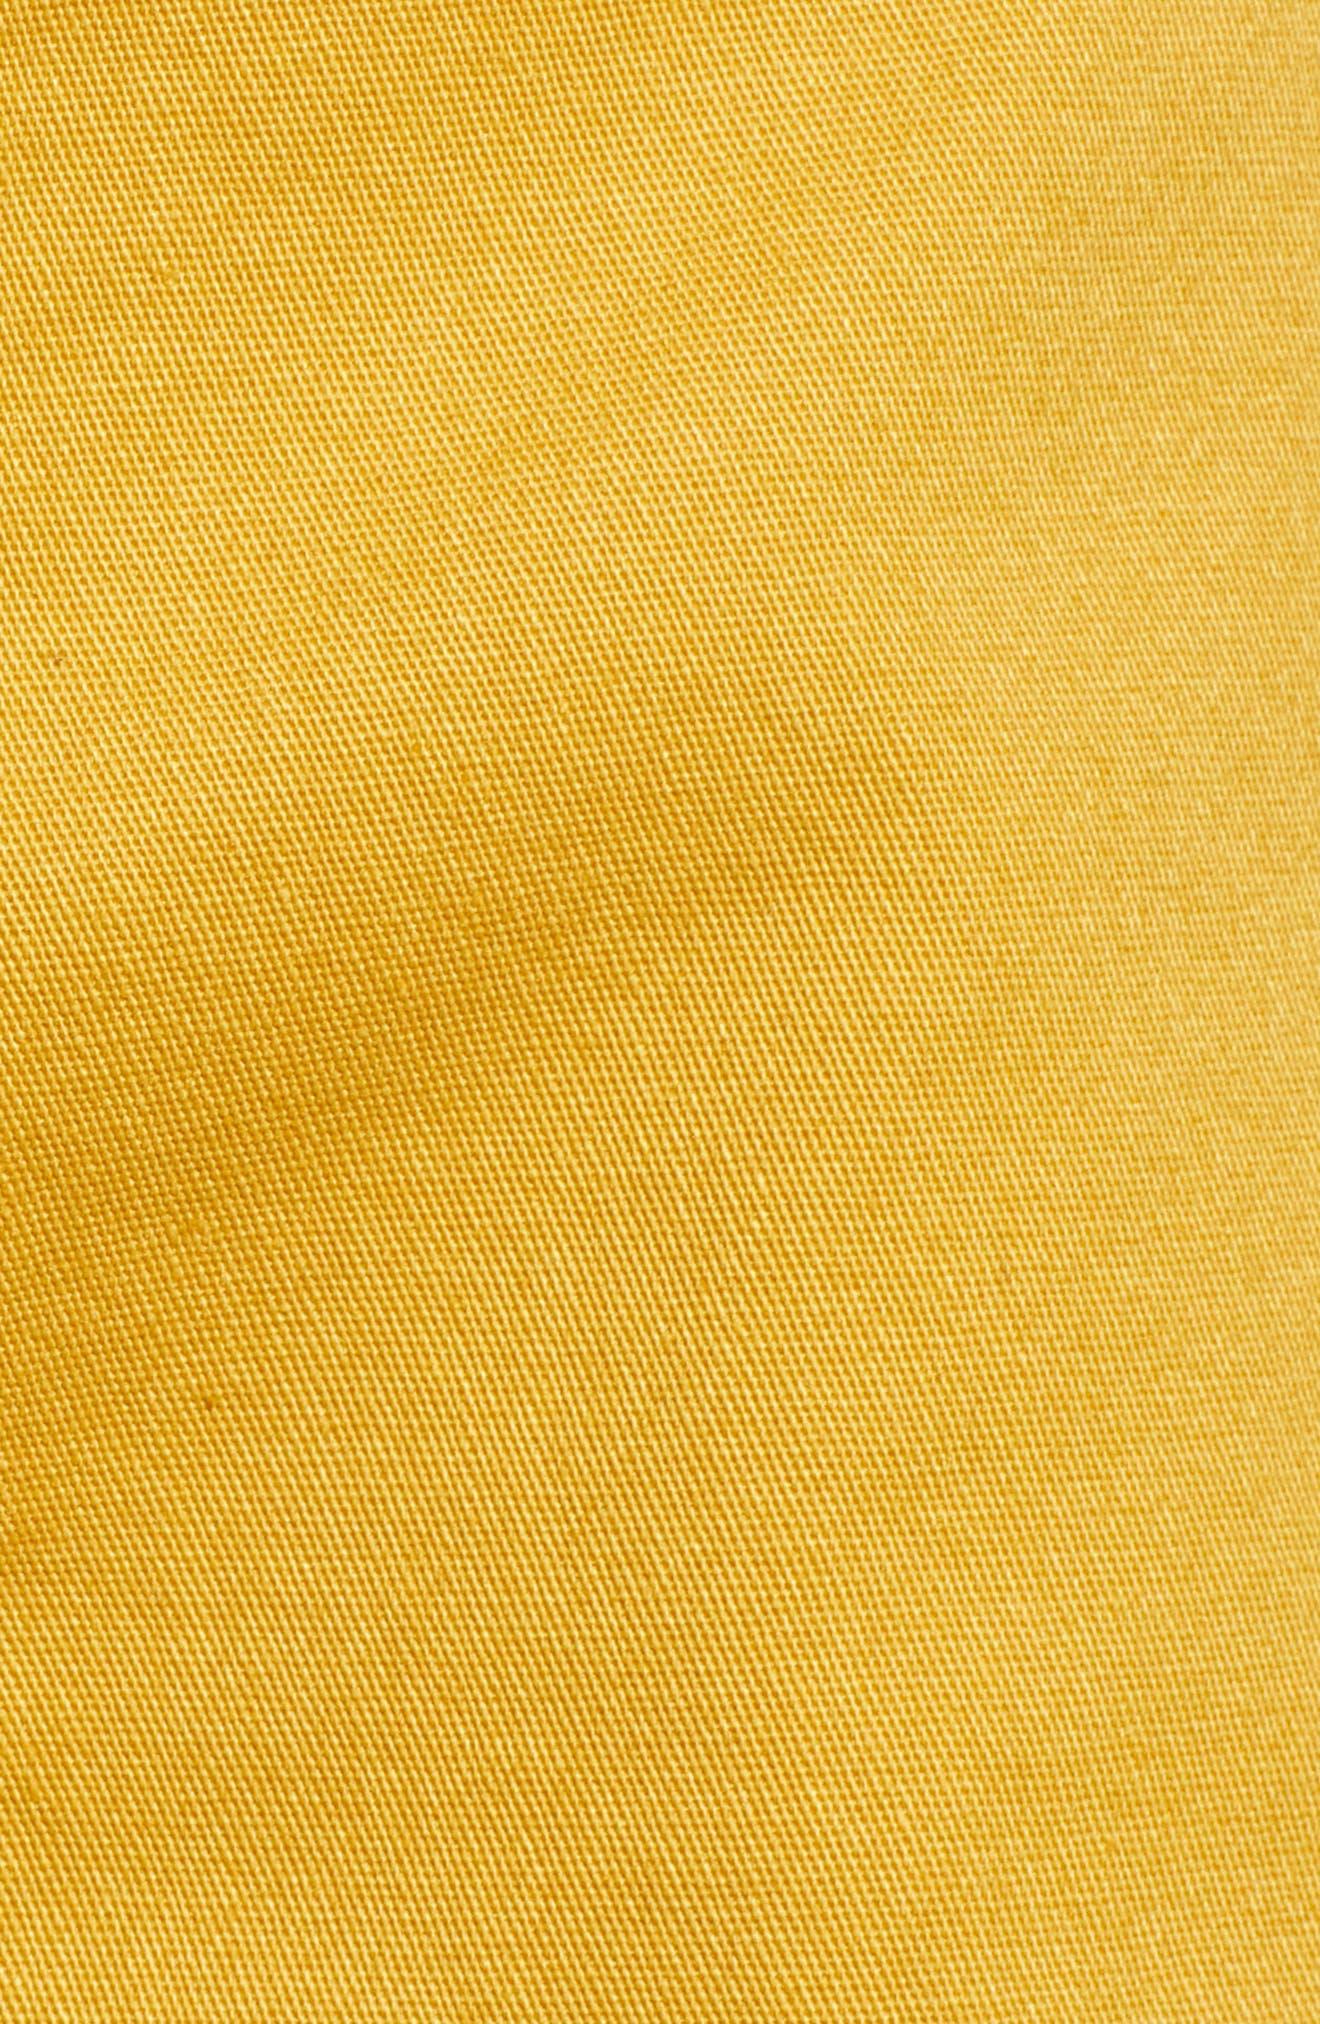 High Waist Sailor Shorts,                             Alternate thumbnail 5, color,                             MUSTARD